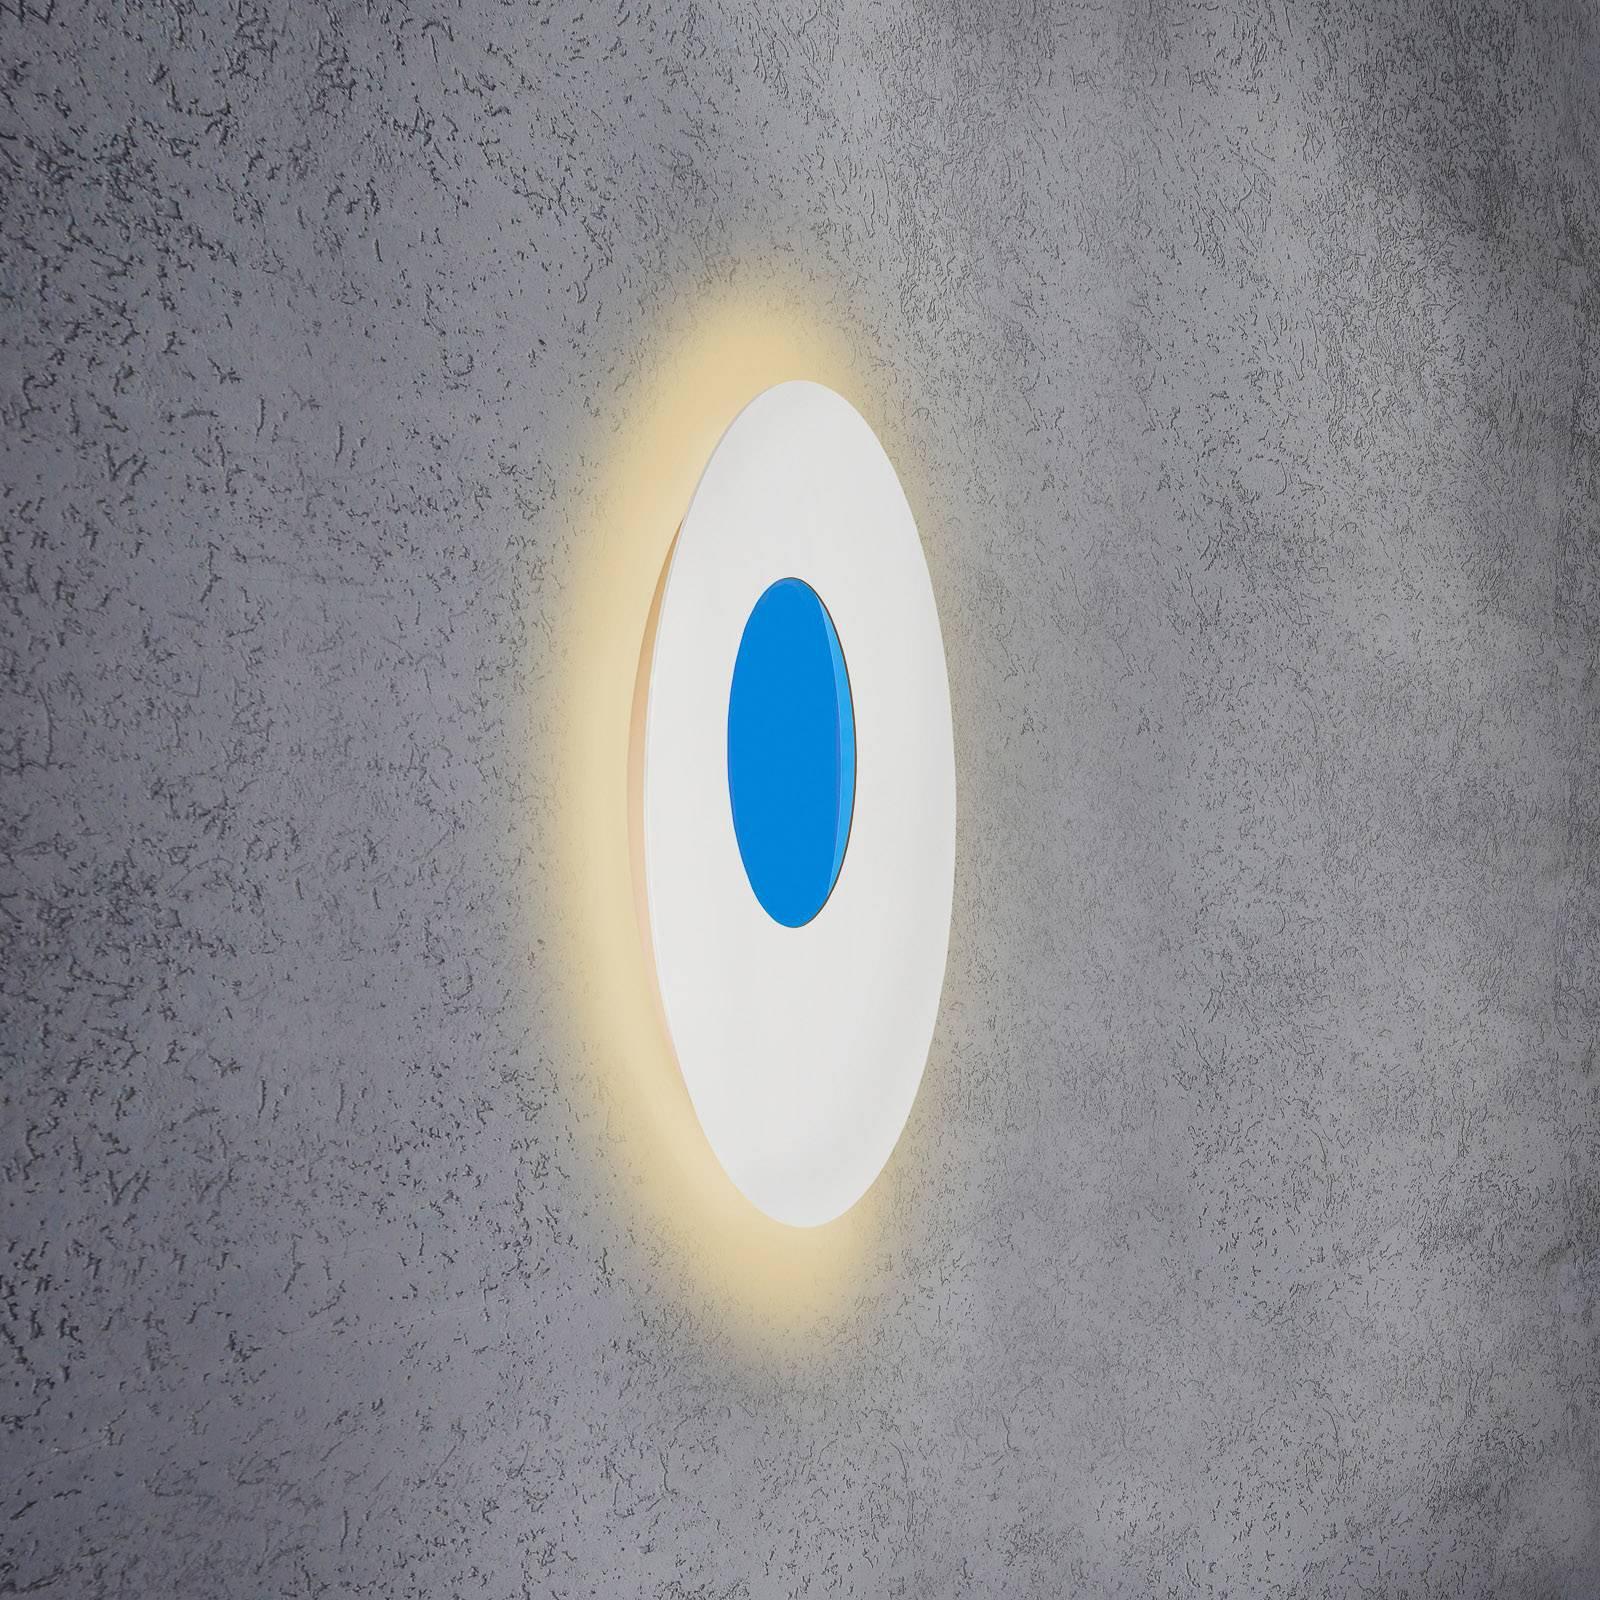 Escale Blade Open LED-vegglampe RGB+W, hvit, Ø59cm